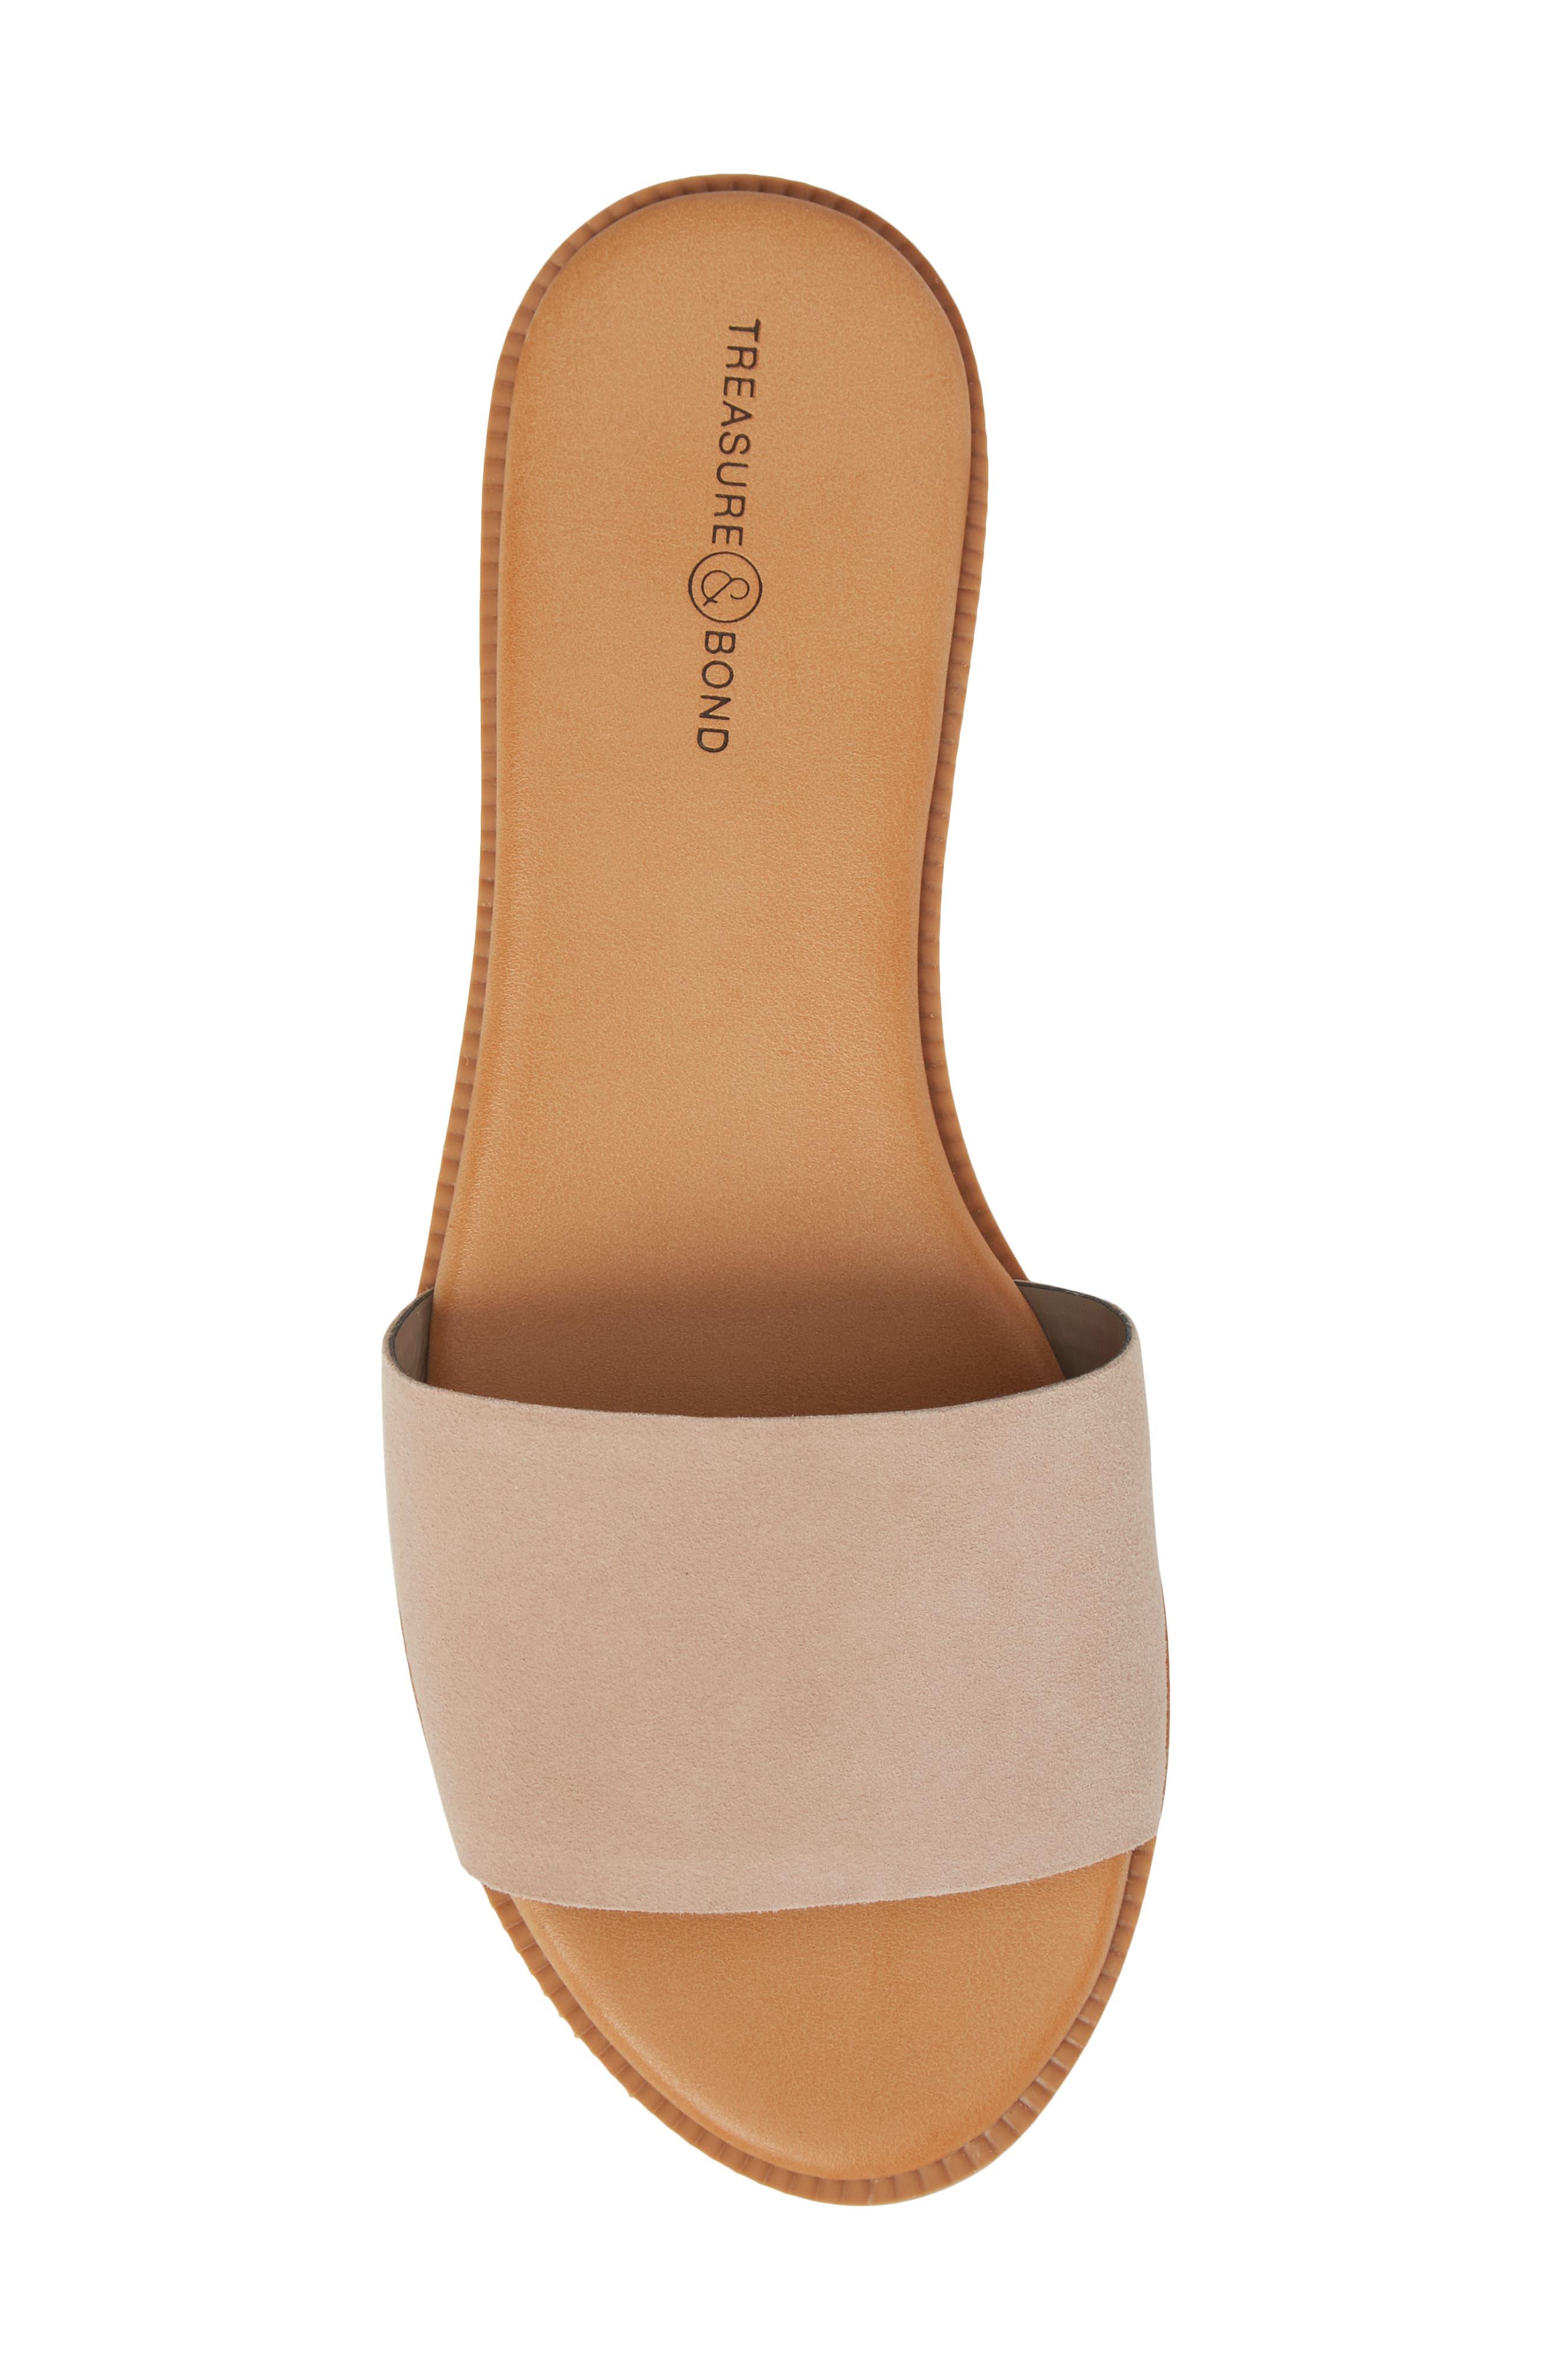 TREASURE & BOND, Mere Flat Slide Sandal, Alternate thumbnail 5, color, NEW BLUSH SUEDE